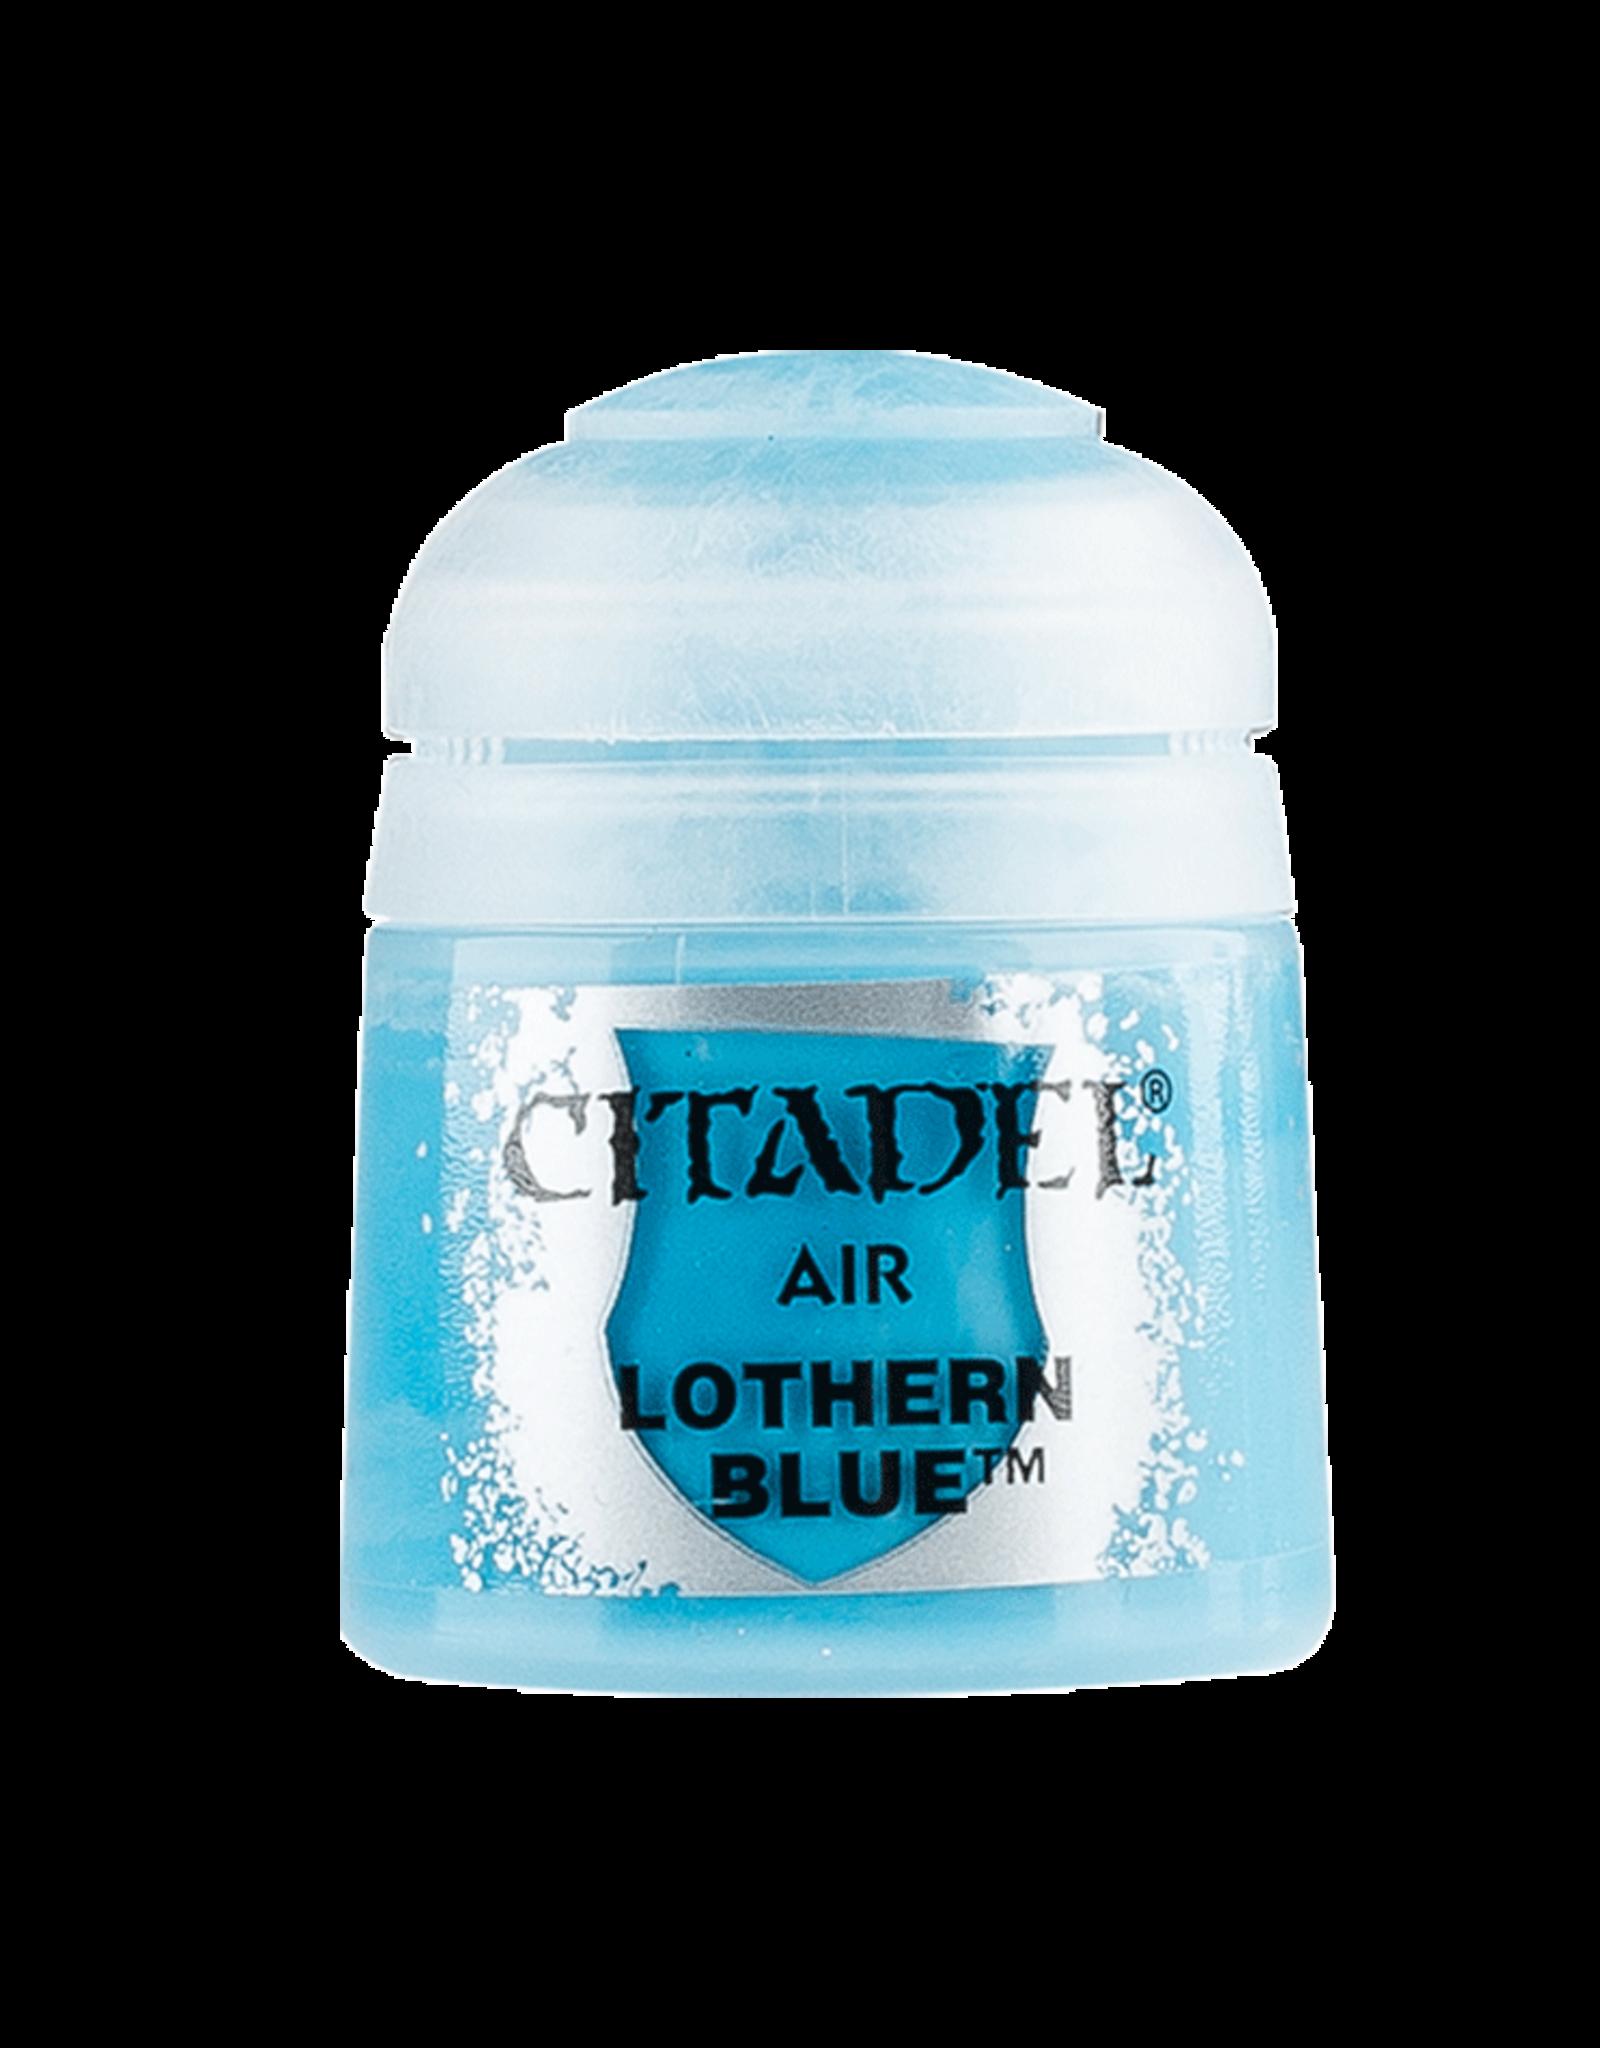 Games Workshop Citadel Air: Lothern Blue (24ml)